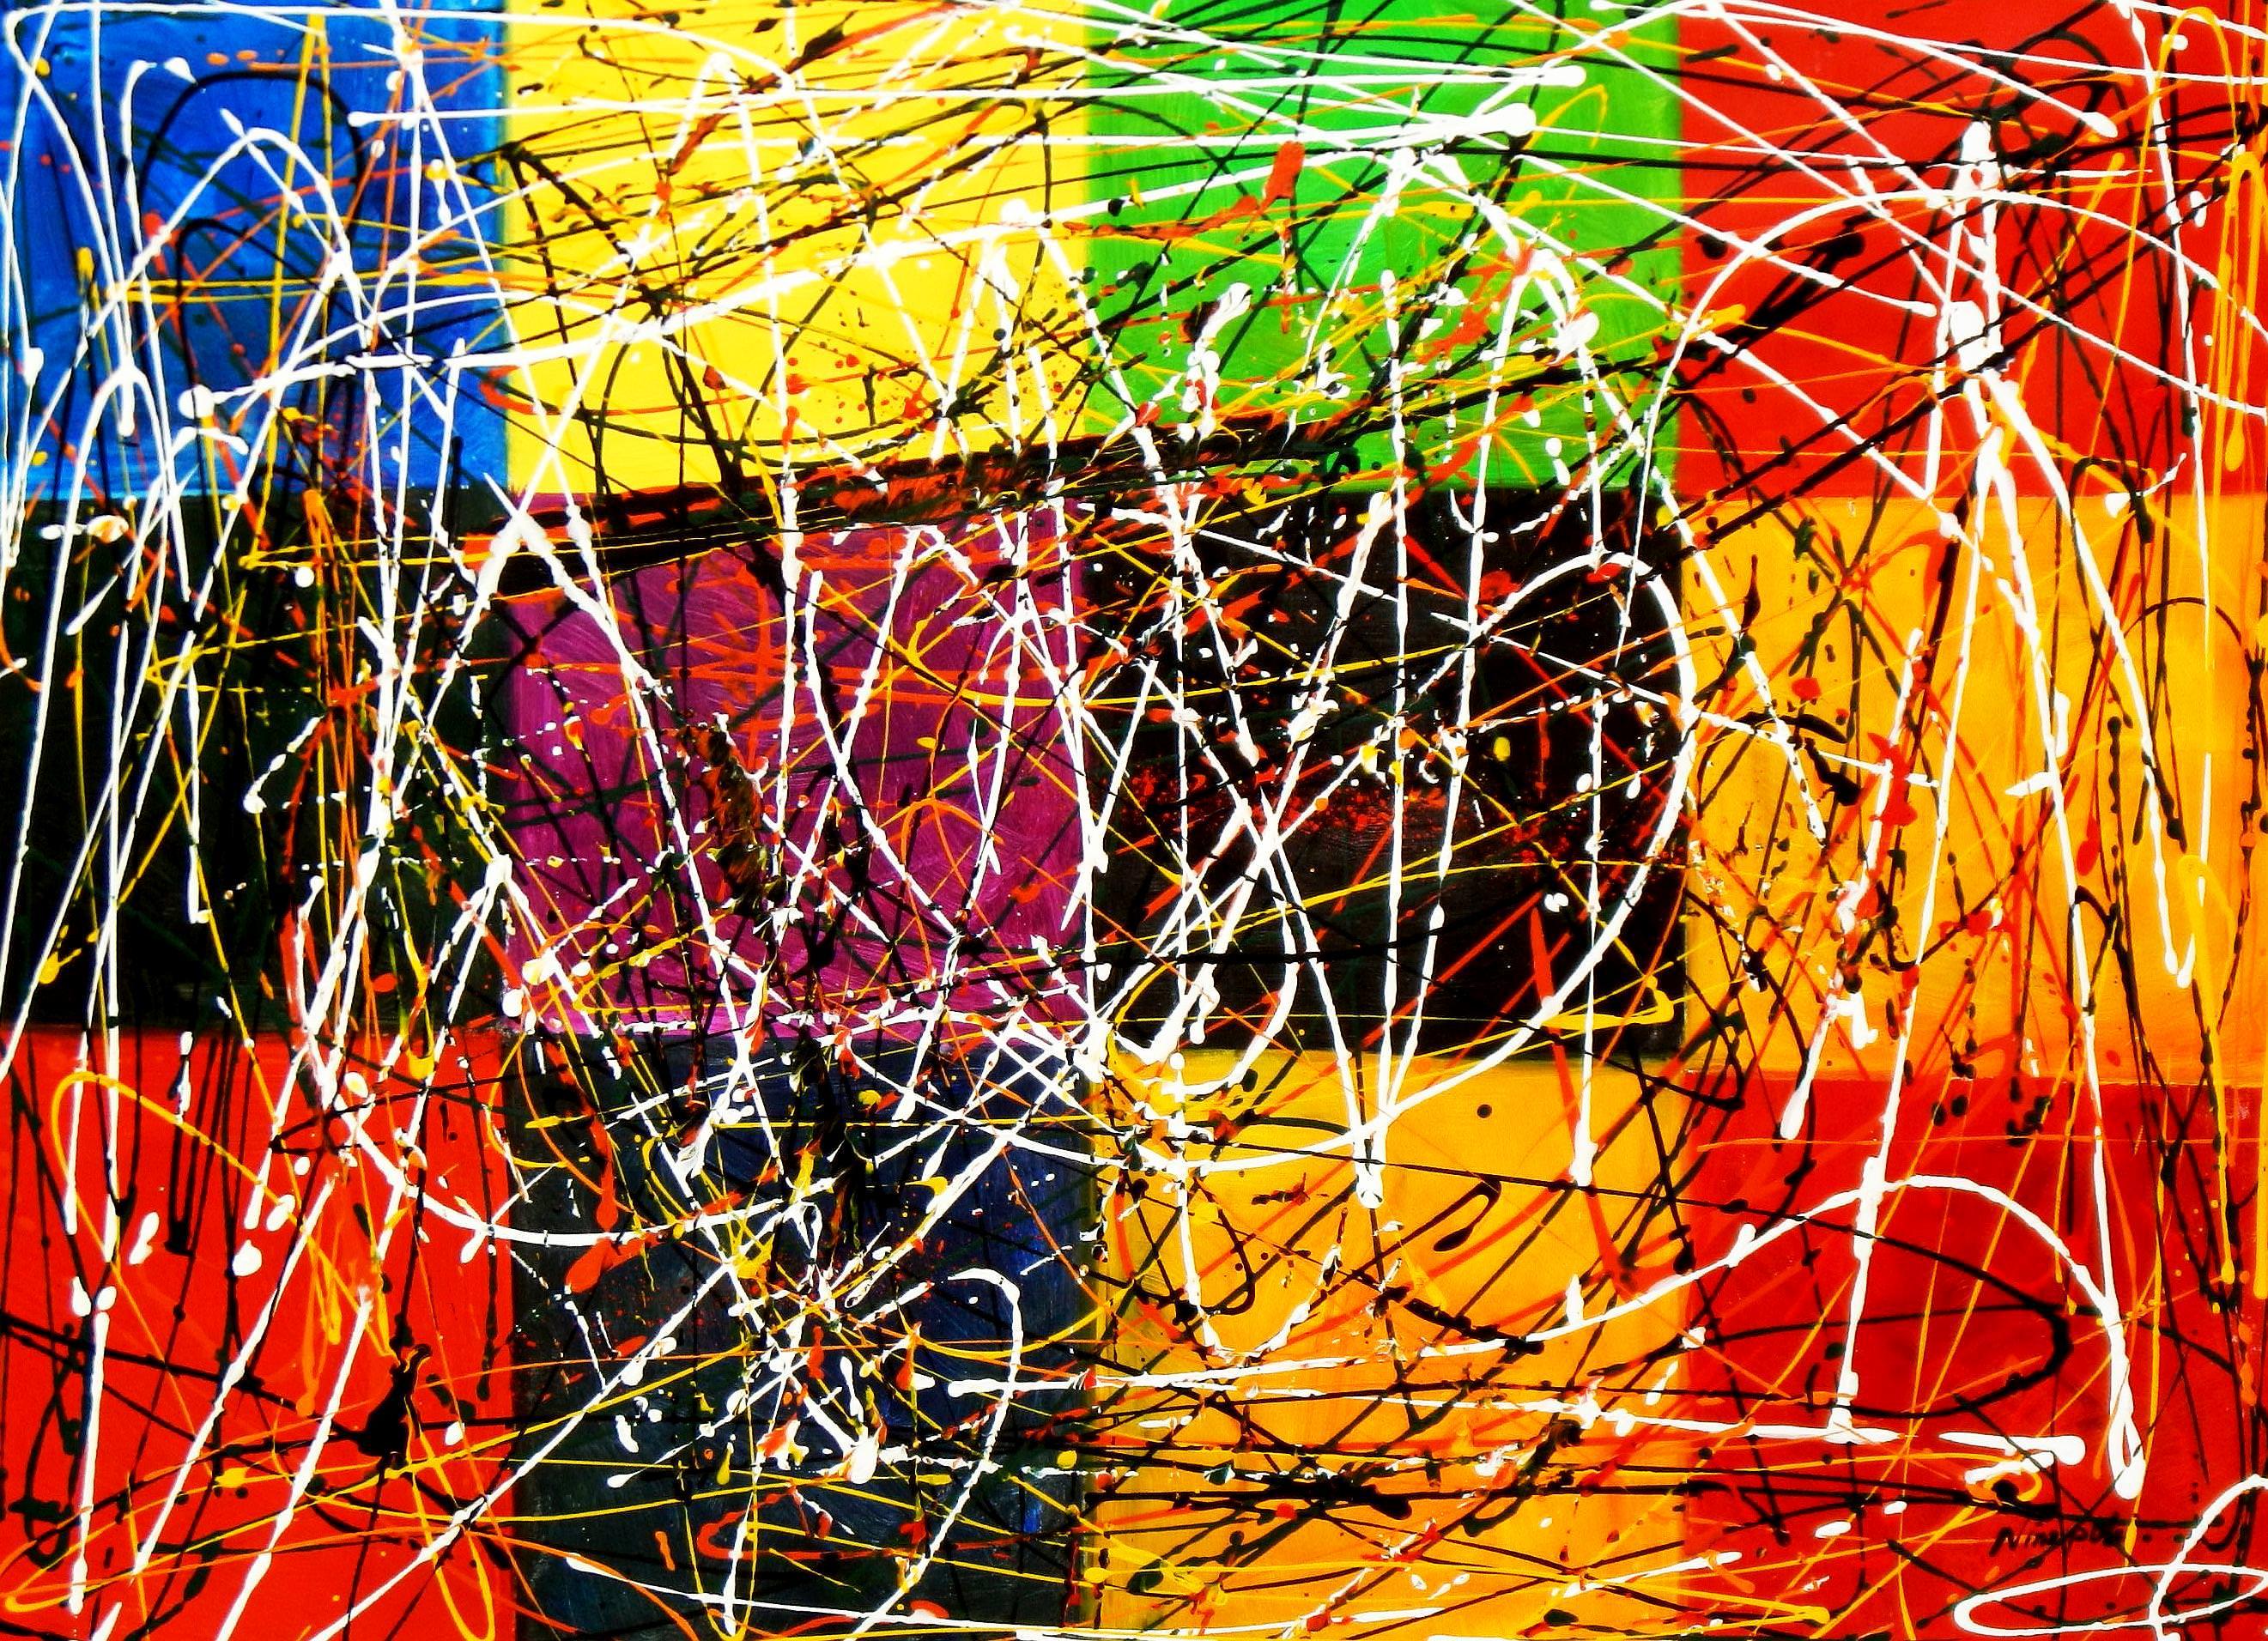 Homage of Pollock - Dripping over cubes i93507 80x110cm abstraktes Ölgemälde handgemalt